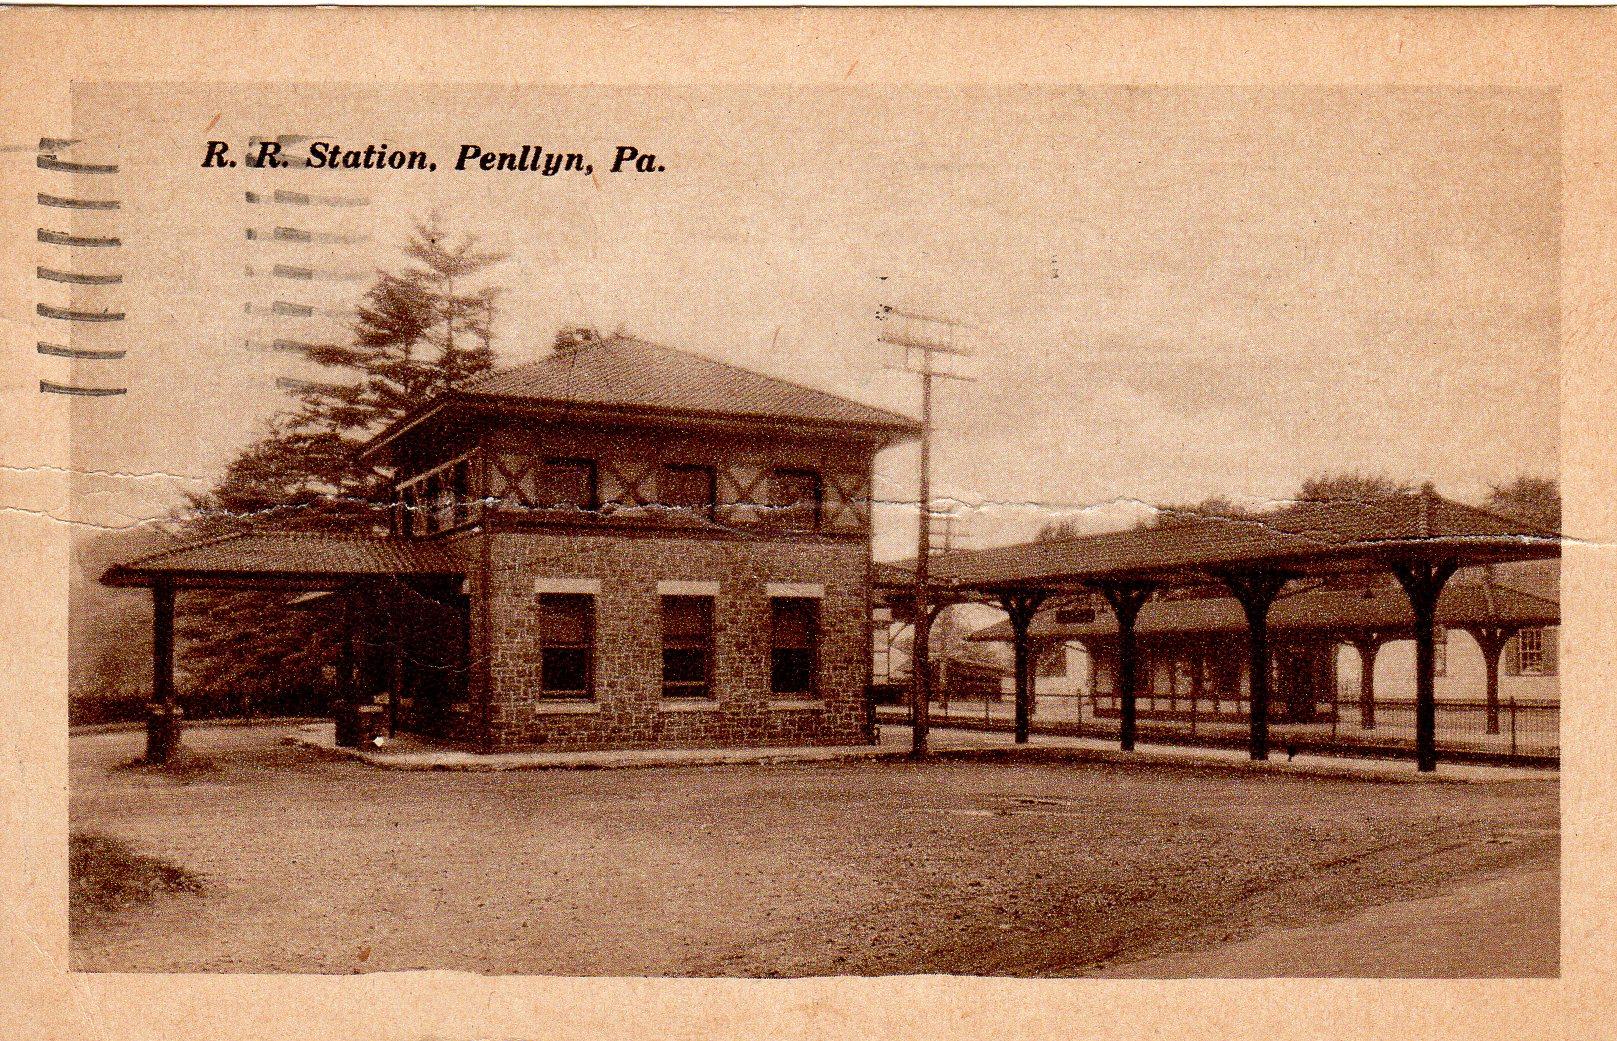 Post Card Collection (E Simon)_2682_70_R R Station, Penllyn, Pa_9 Jun 1948